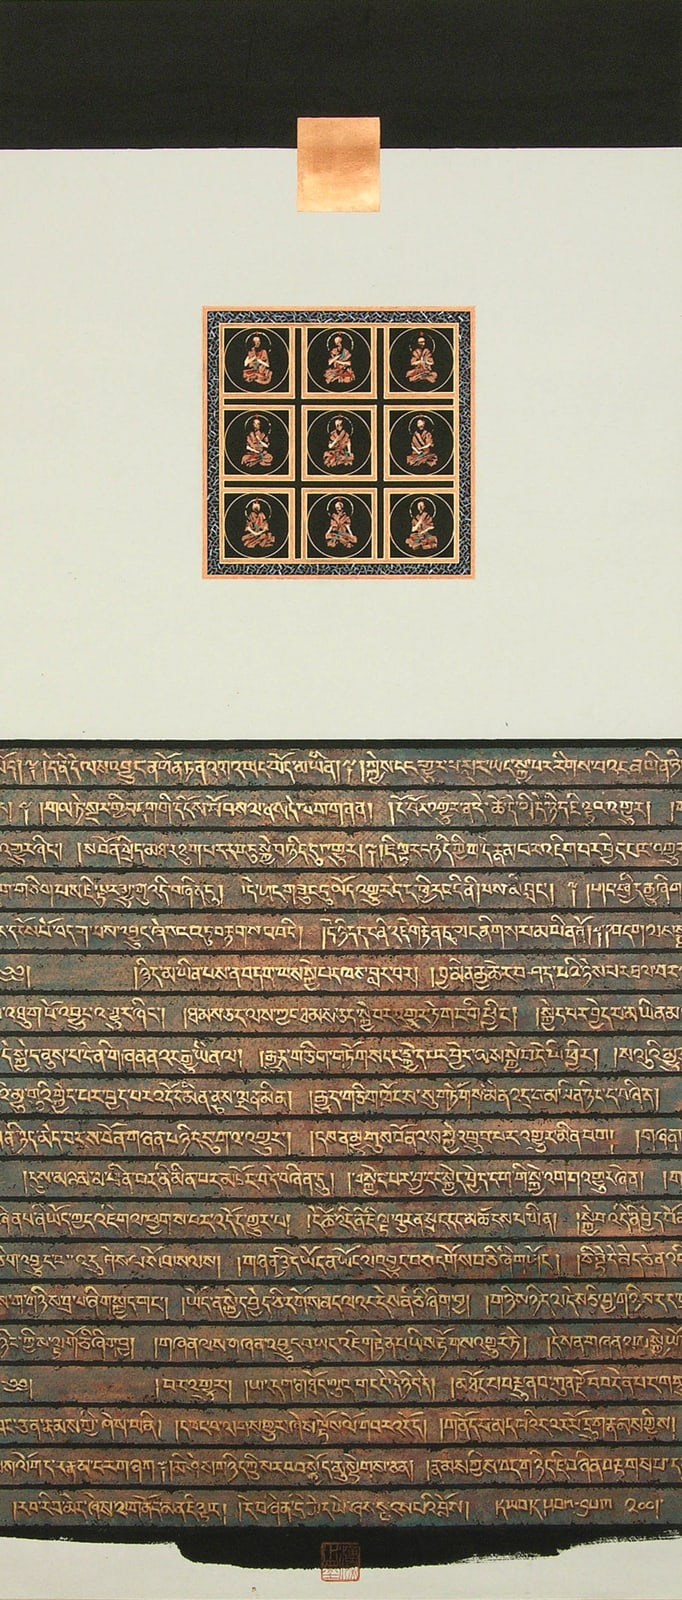 Kwok Hon Sum 郭漢深, Deeply Enter the Sutra Treasury 深入經藏, 2001